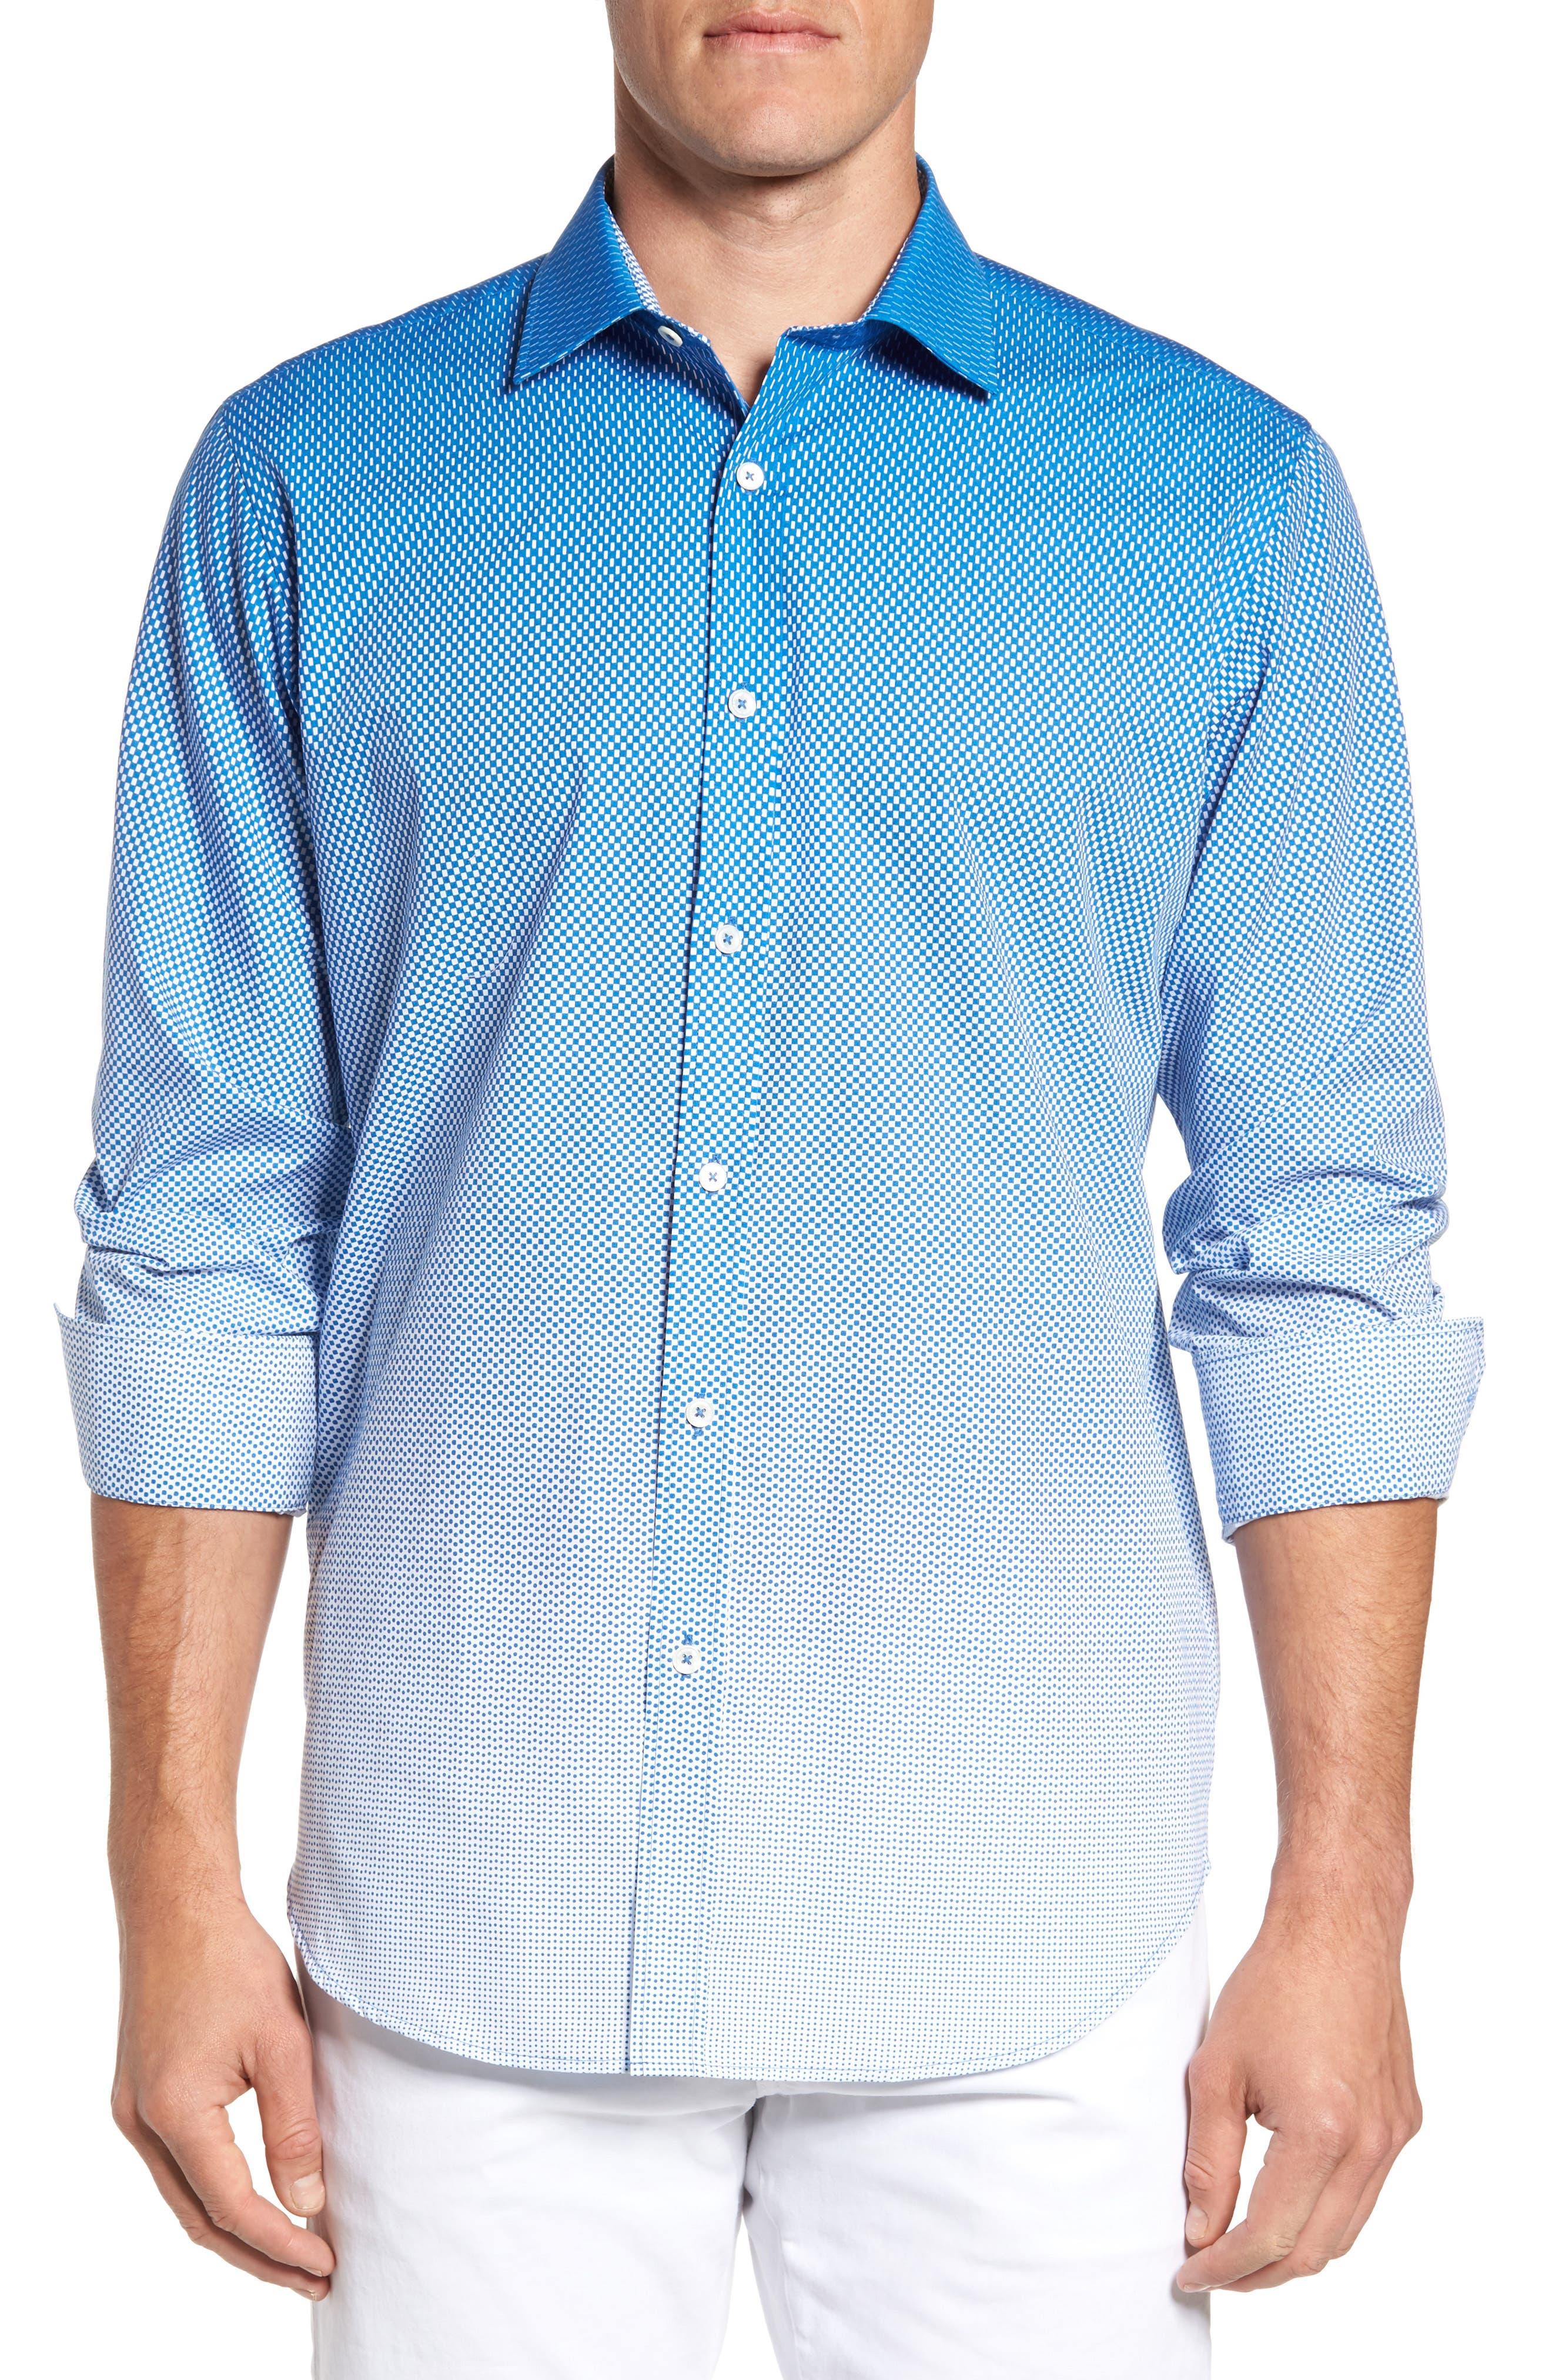 Alternate Image 1 Selected - Bugatchi Print Sport Shirt